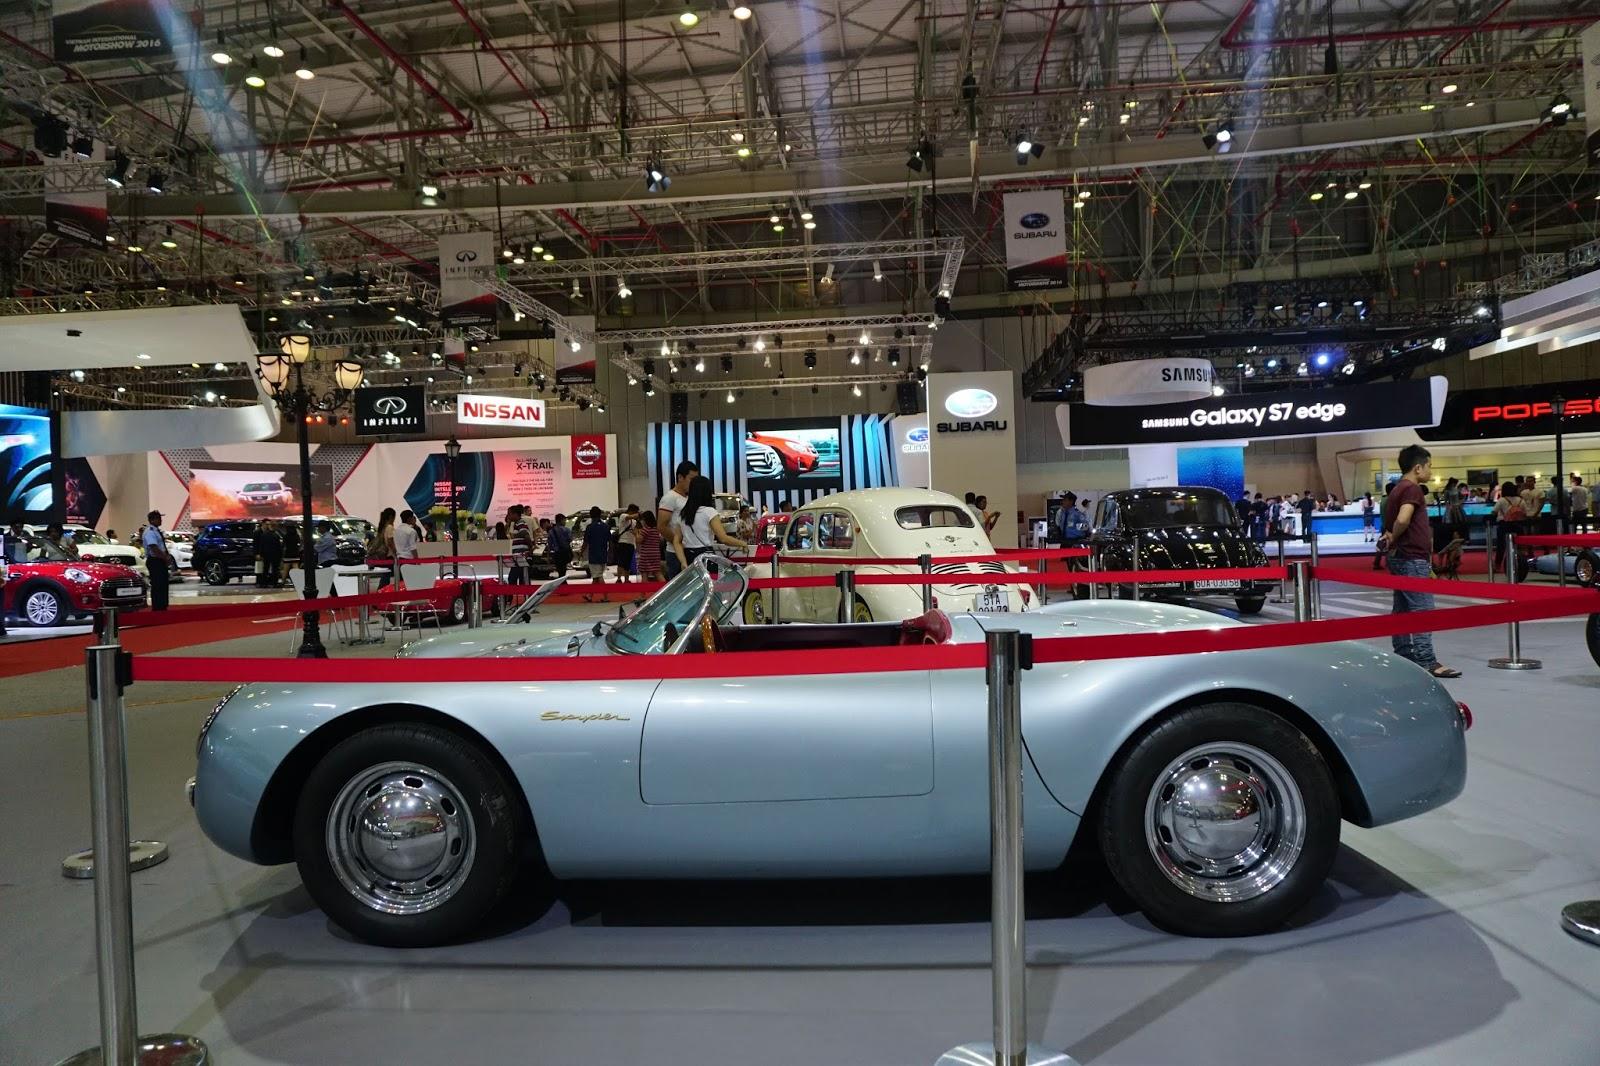 Siêu phẩm giống của James Bond 007 là Porsche 550